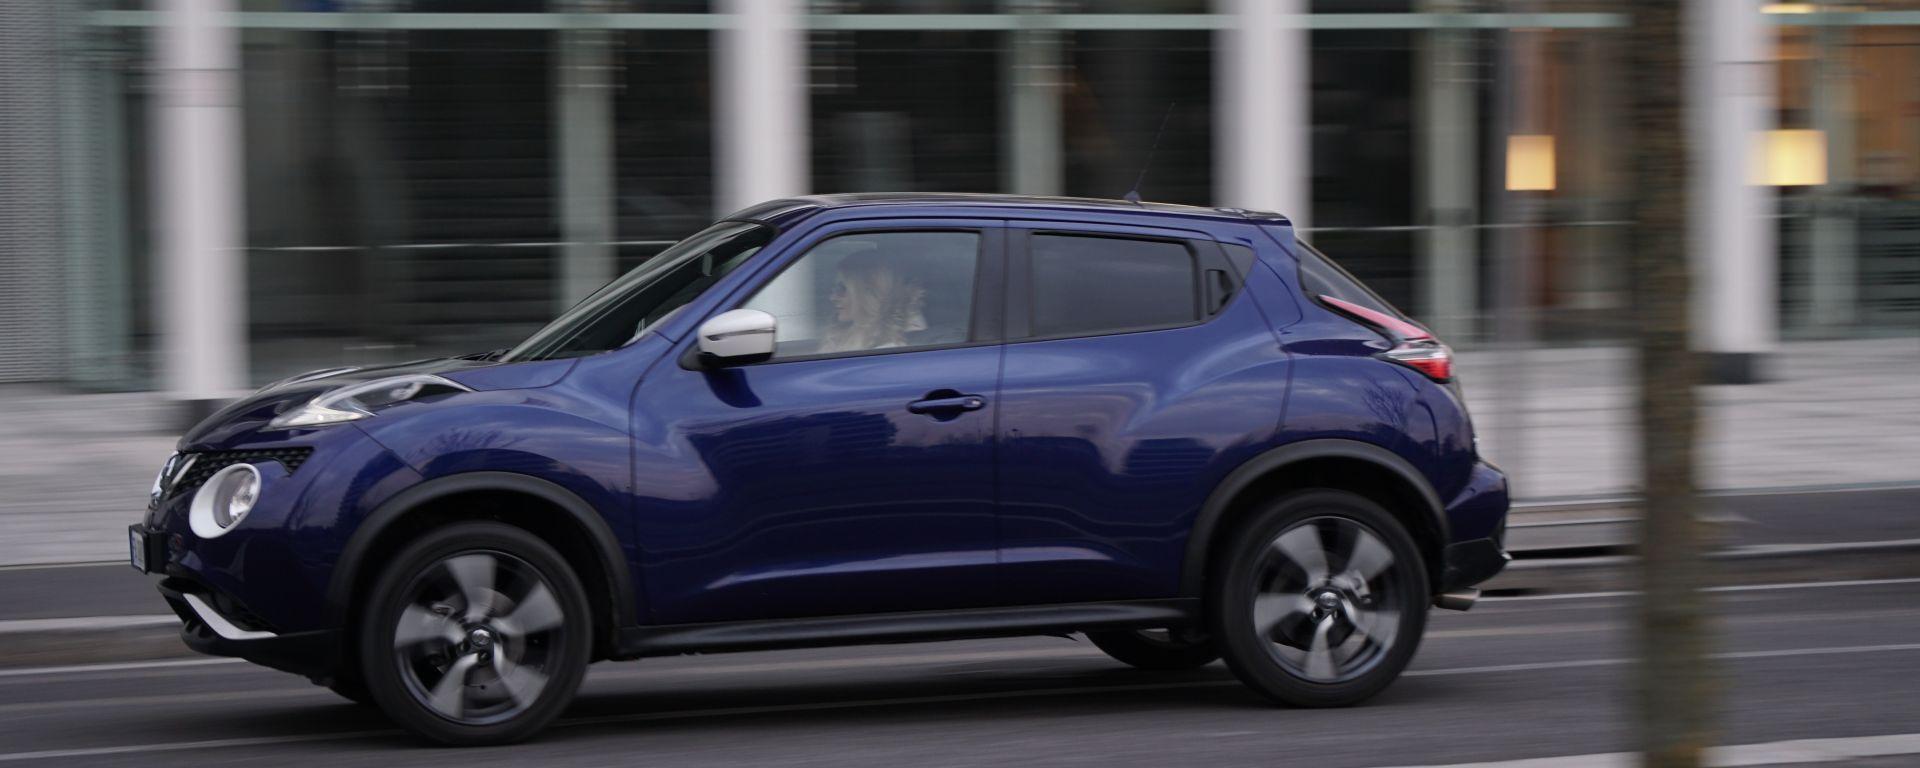 Nissan Juke 1.5 DCi N-Connecta - linee ondulate per la crossover dall'anima sportiva